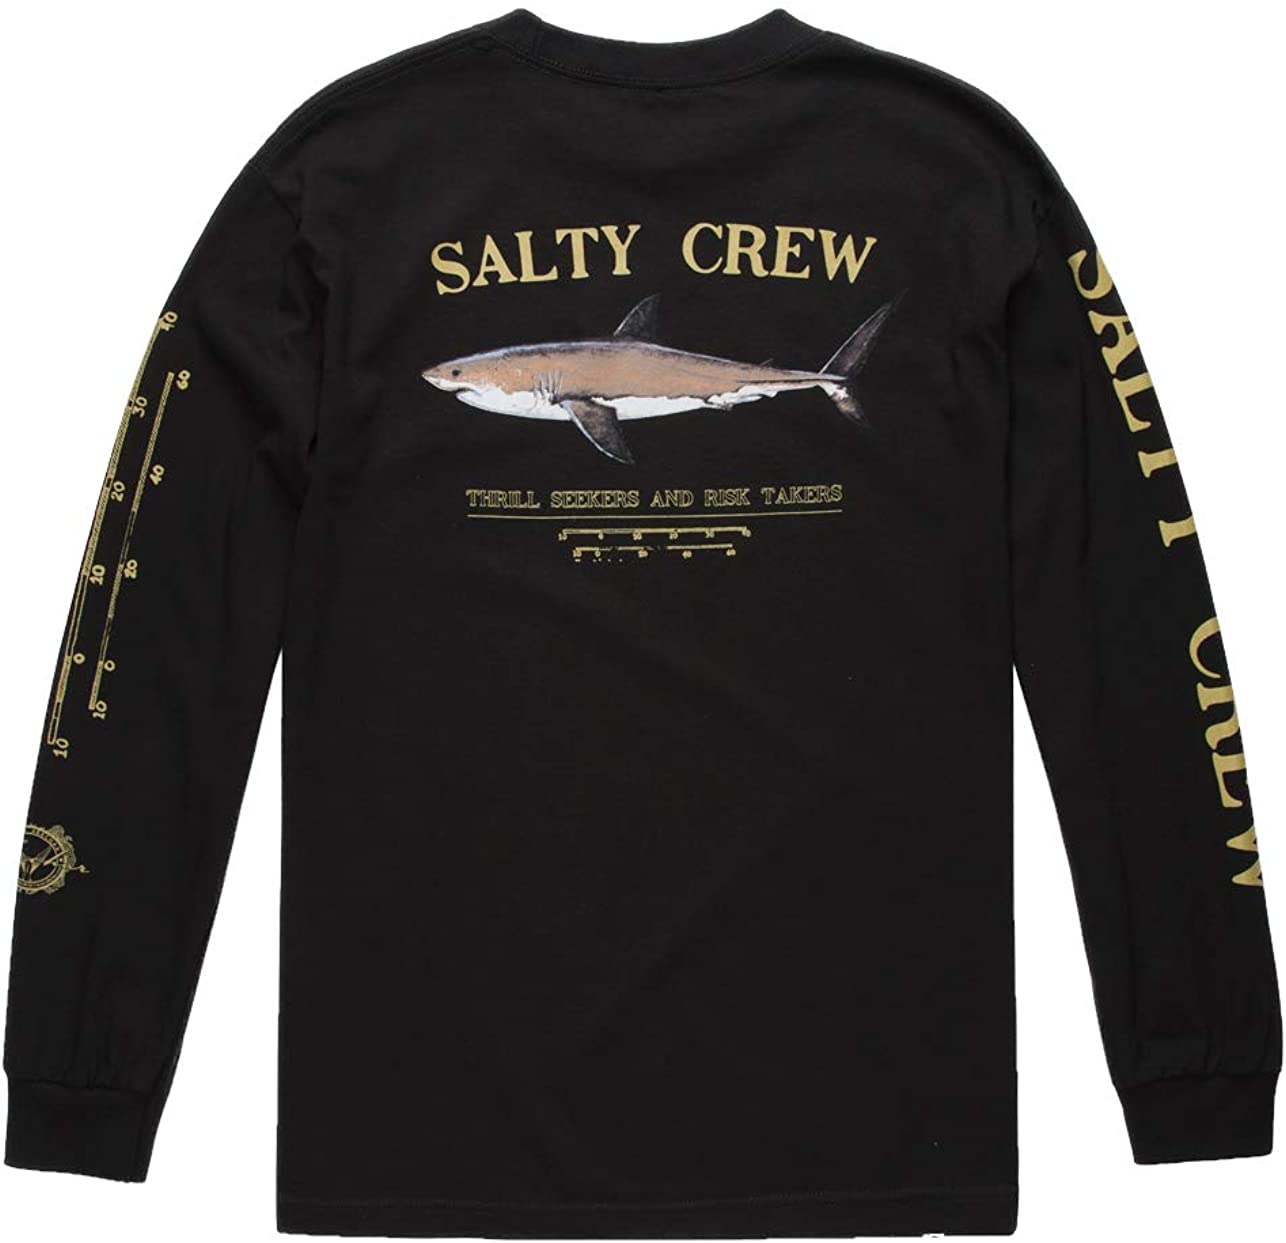 Salty Crew Men's Bruce Long Sleeve Tee